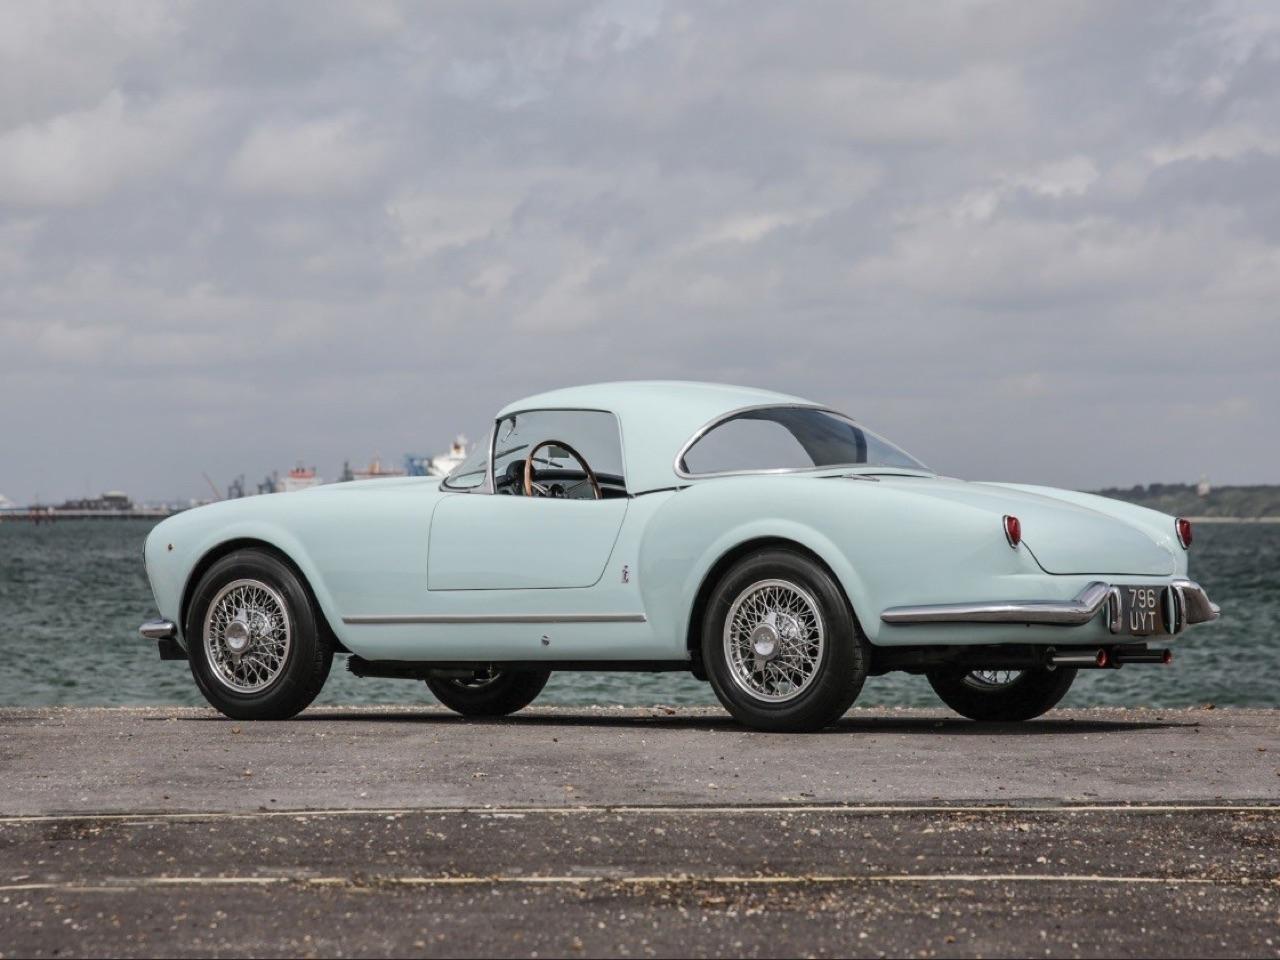 '55 Lancia Aurelia Spider B24... Perfetto ! 3